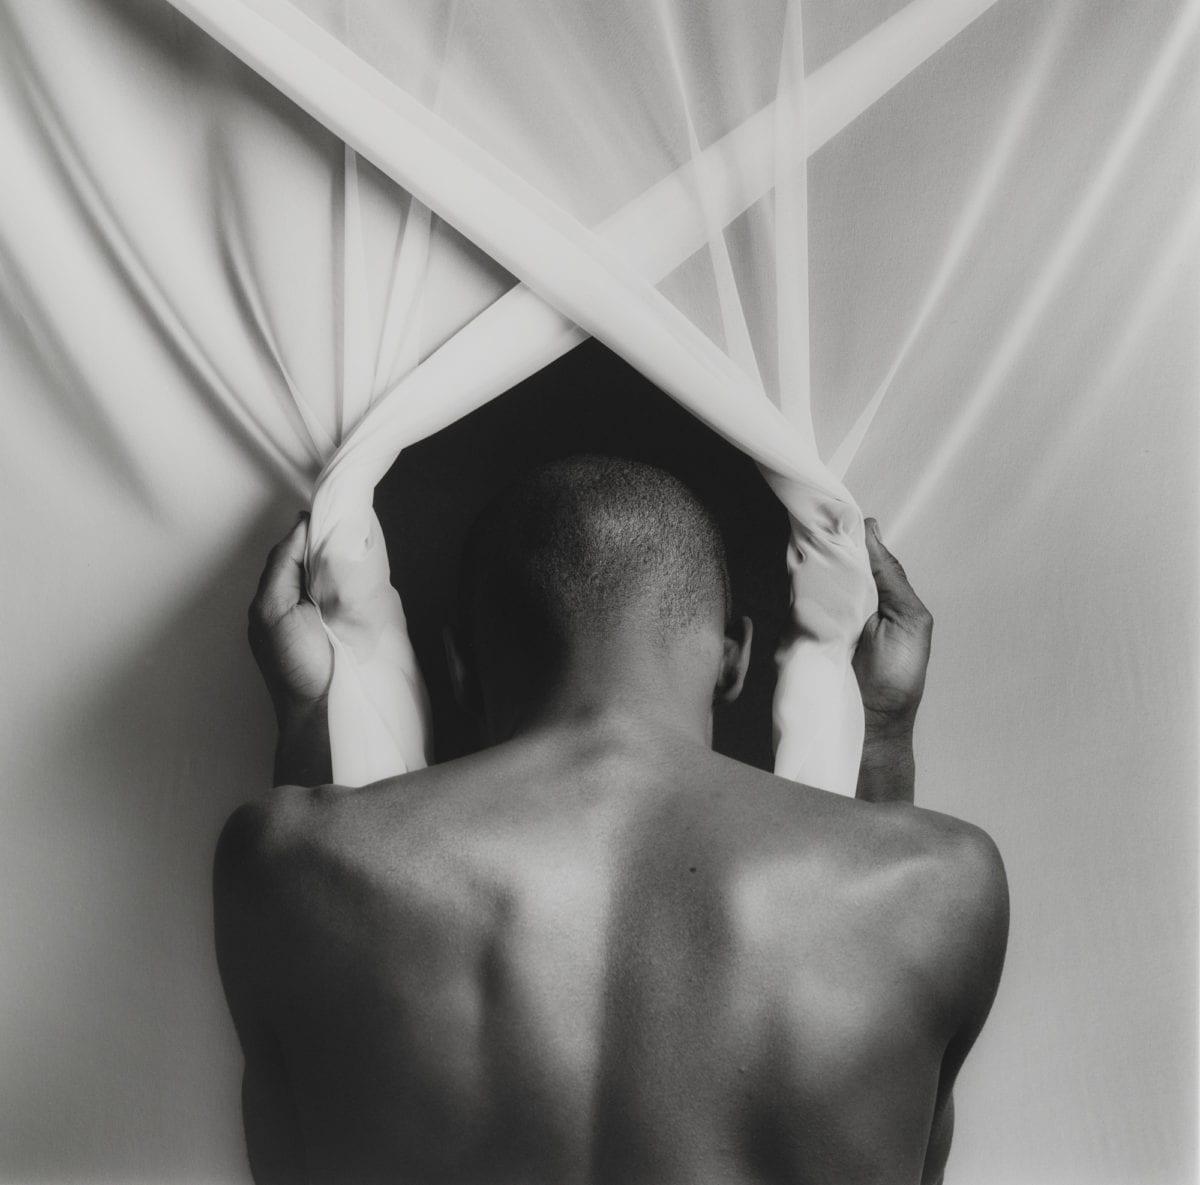 Phillip Prioleau, 1982. Courtesy Solomon R. Guggenheim Museum, New York; Gift, The Robert Mapplethorpe Foundation, 1996